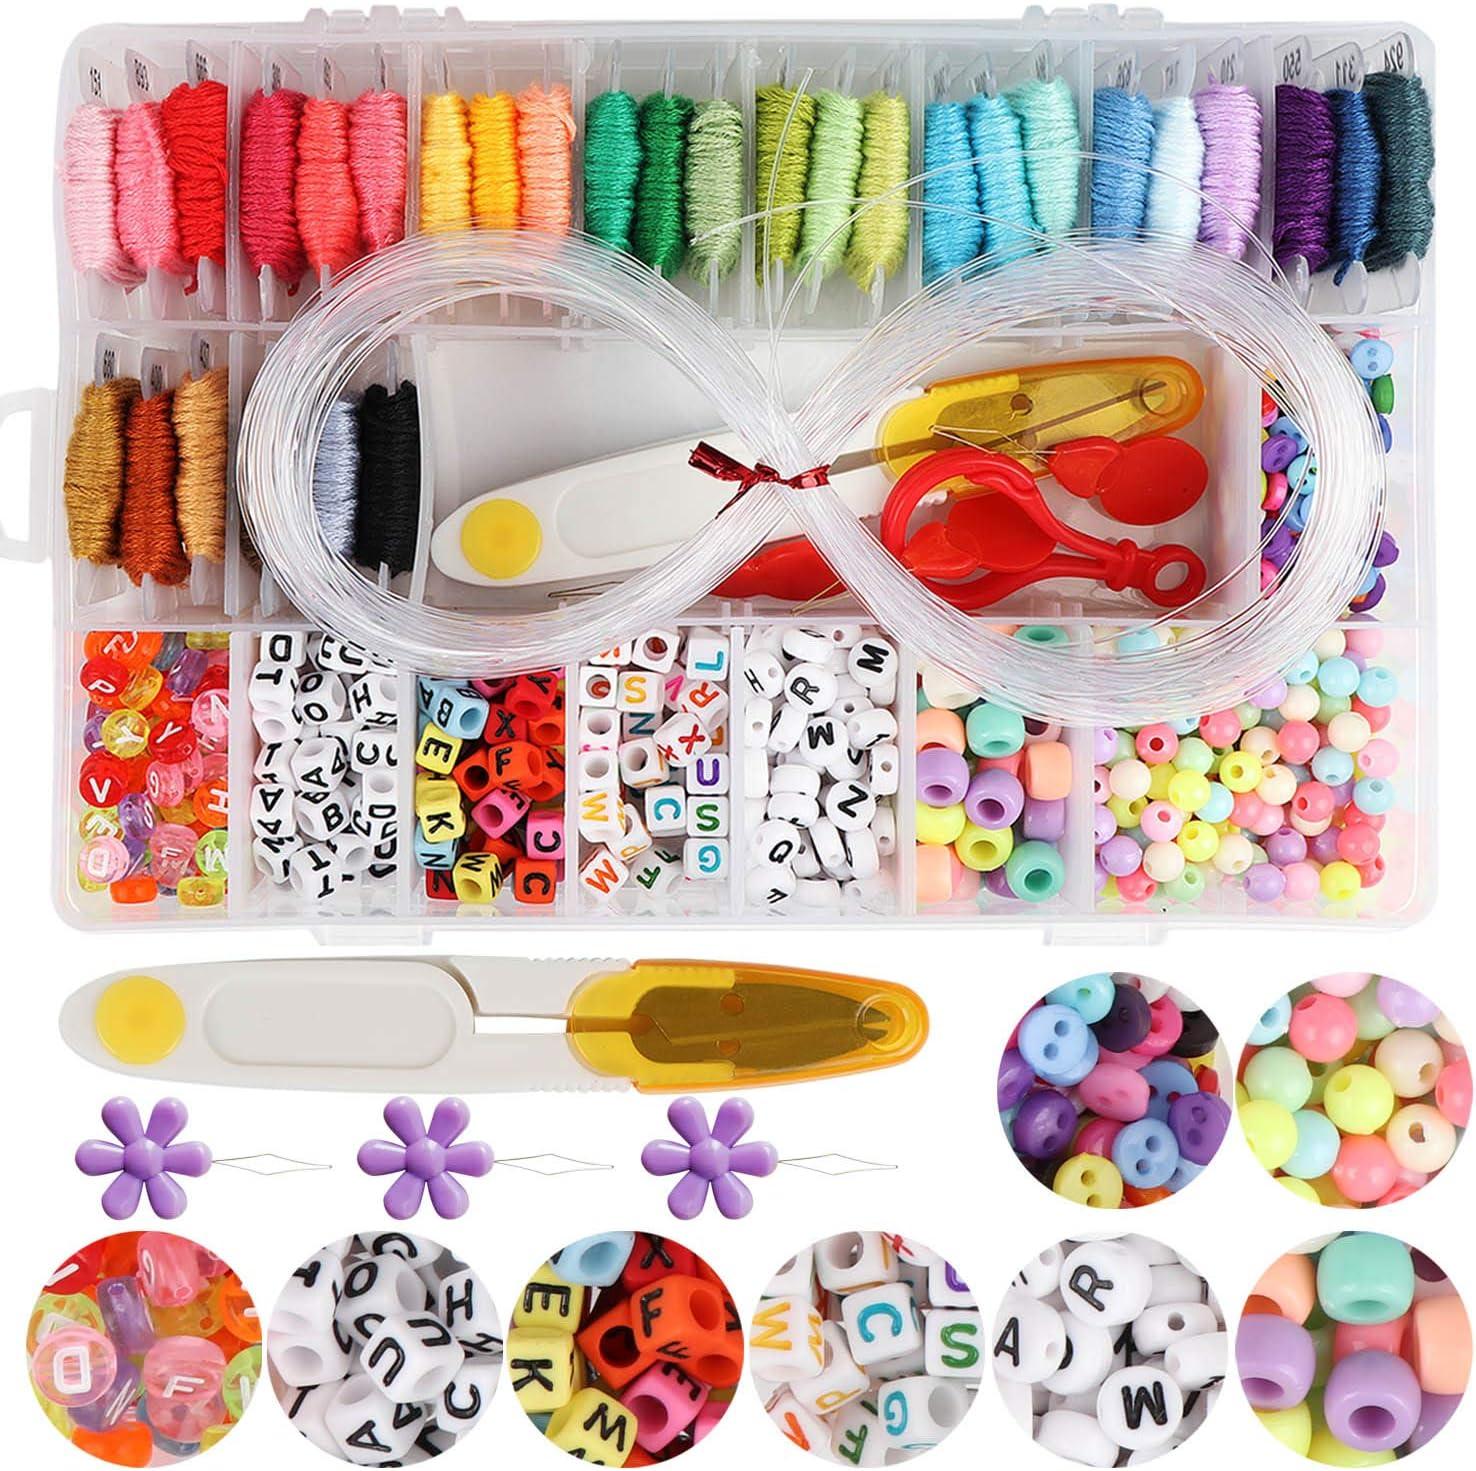 Craft kit Girls Beading kit Bead Kits Kids Beads Bracelet Making kit Jewelry kit just My Style Boys Toddler Jewelry Making kit Friendship Letter Bracelet Kids Necklace Making kit